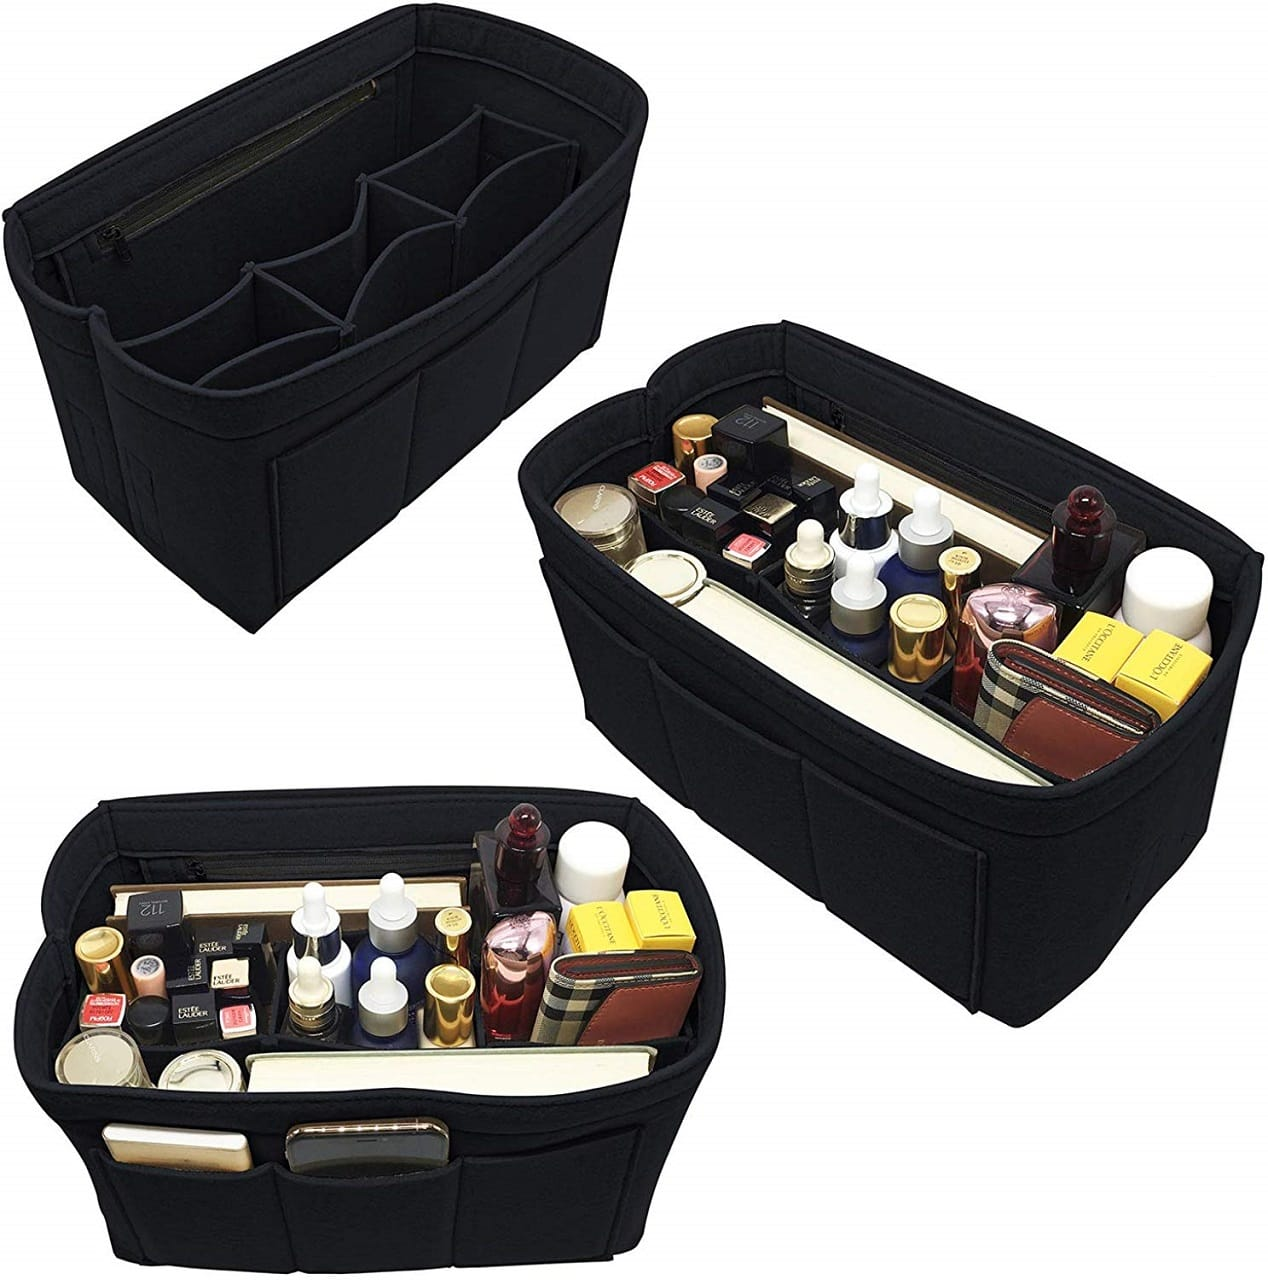 x gift luxury felt purse organizer image